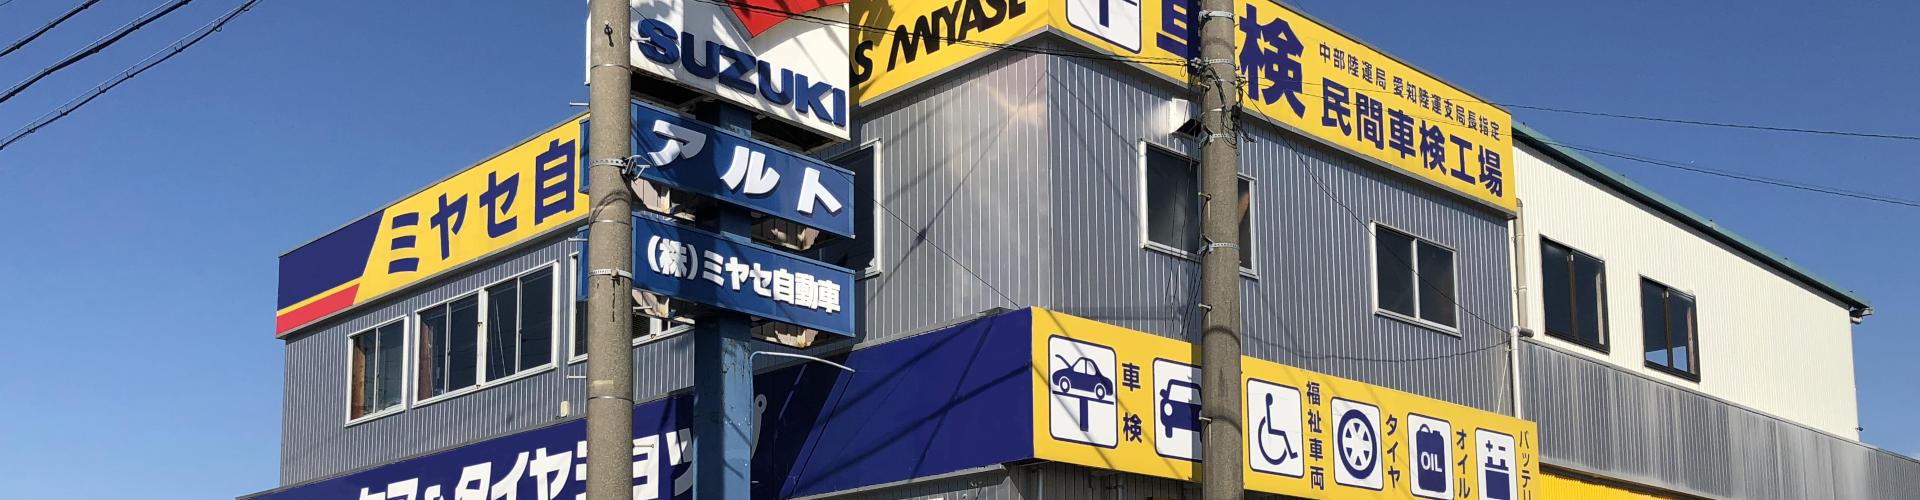 Welcome to Miyase